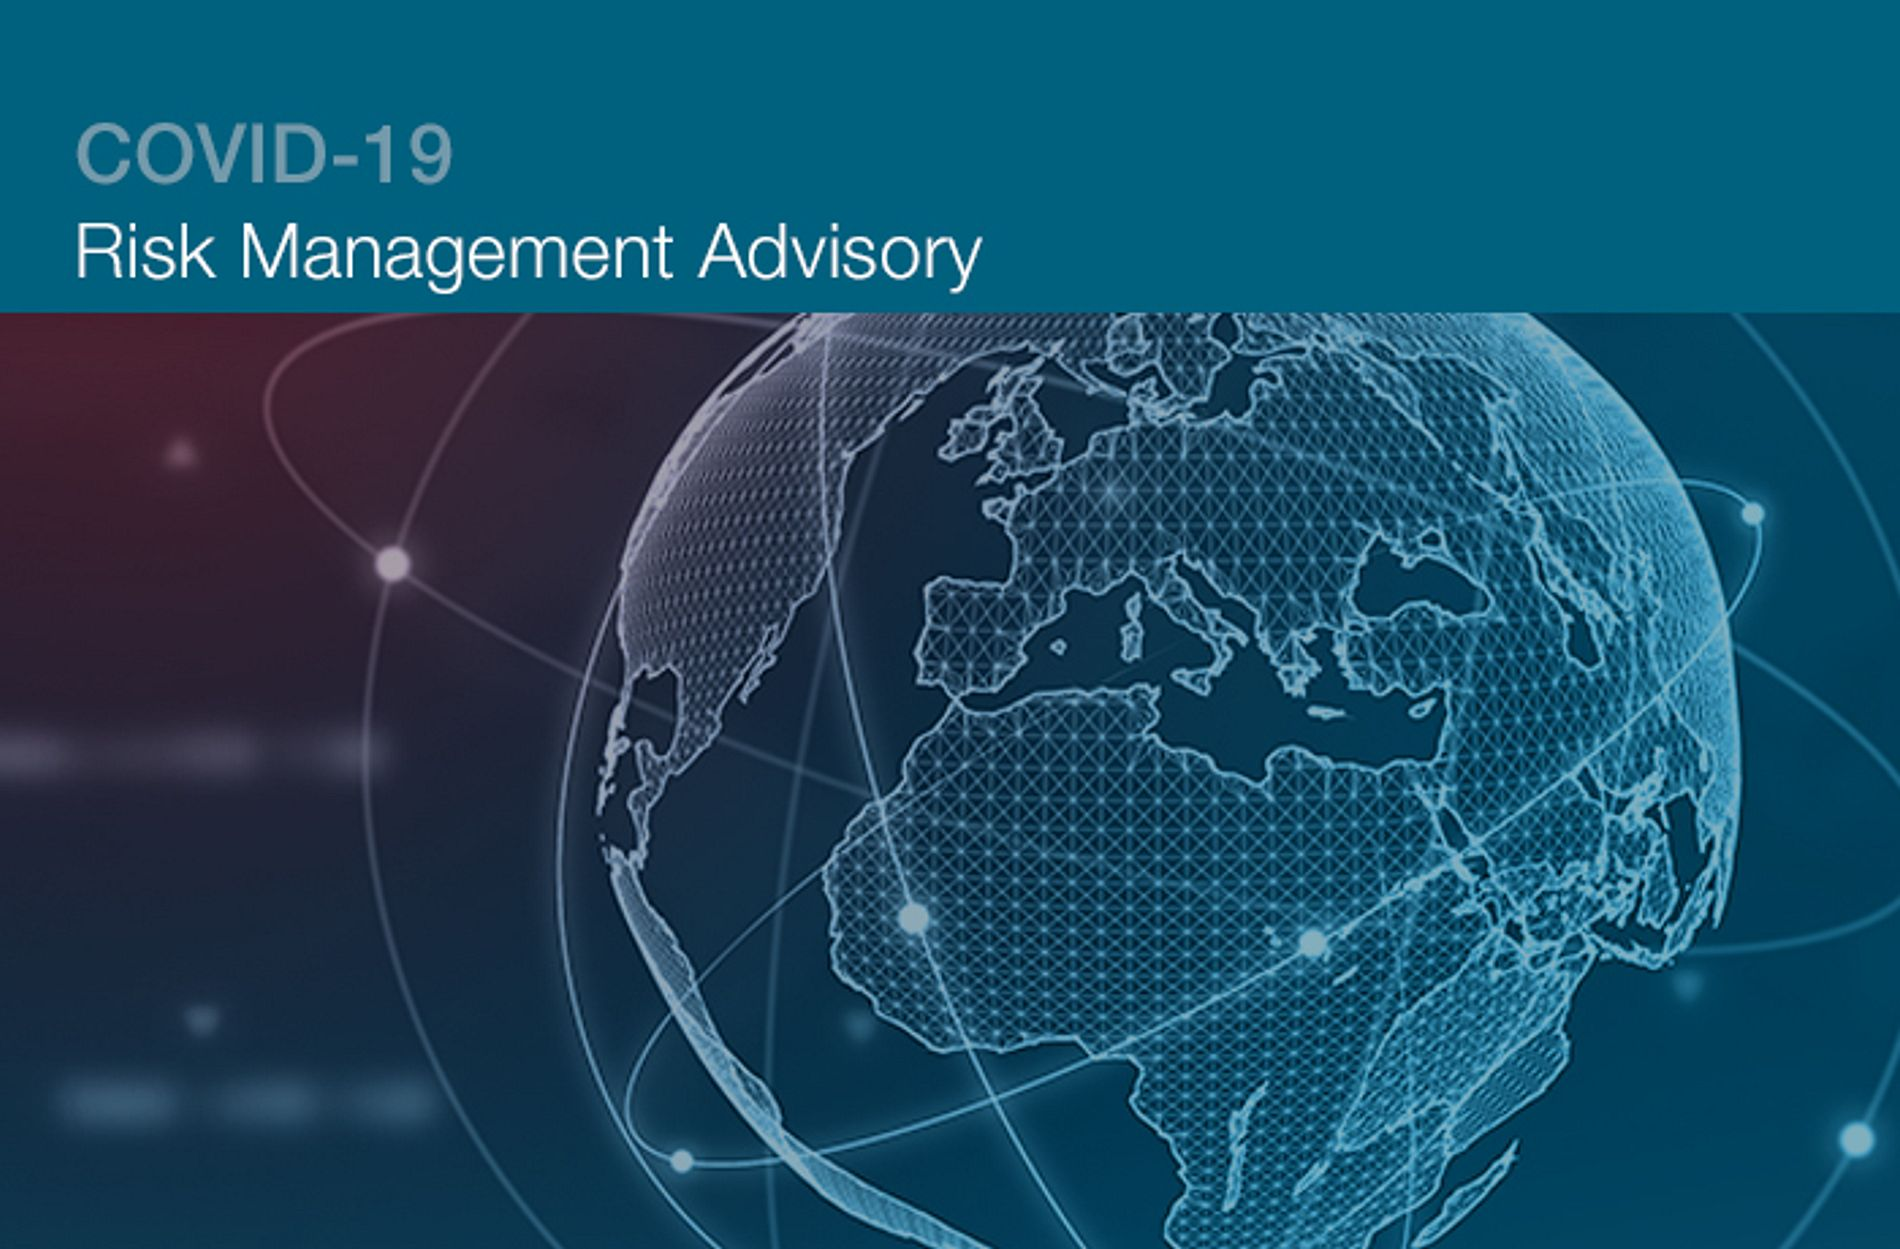 Risk management advisory